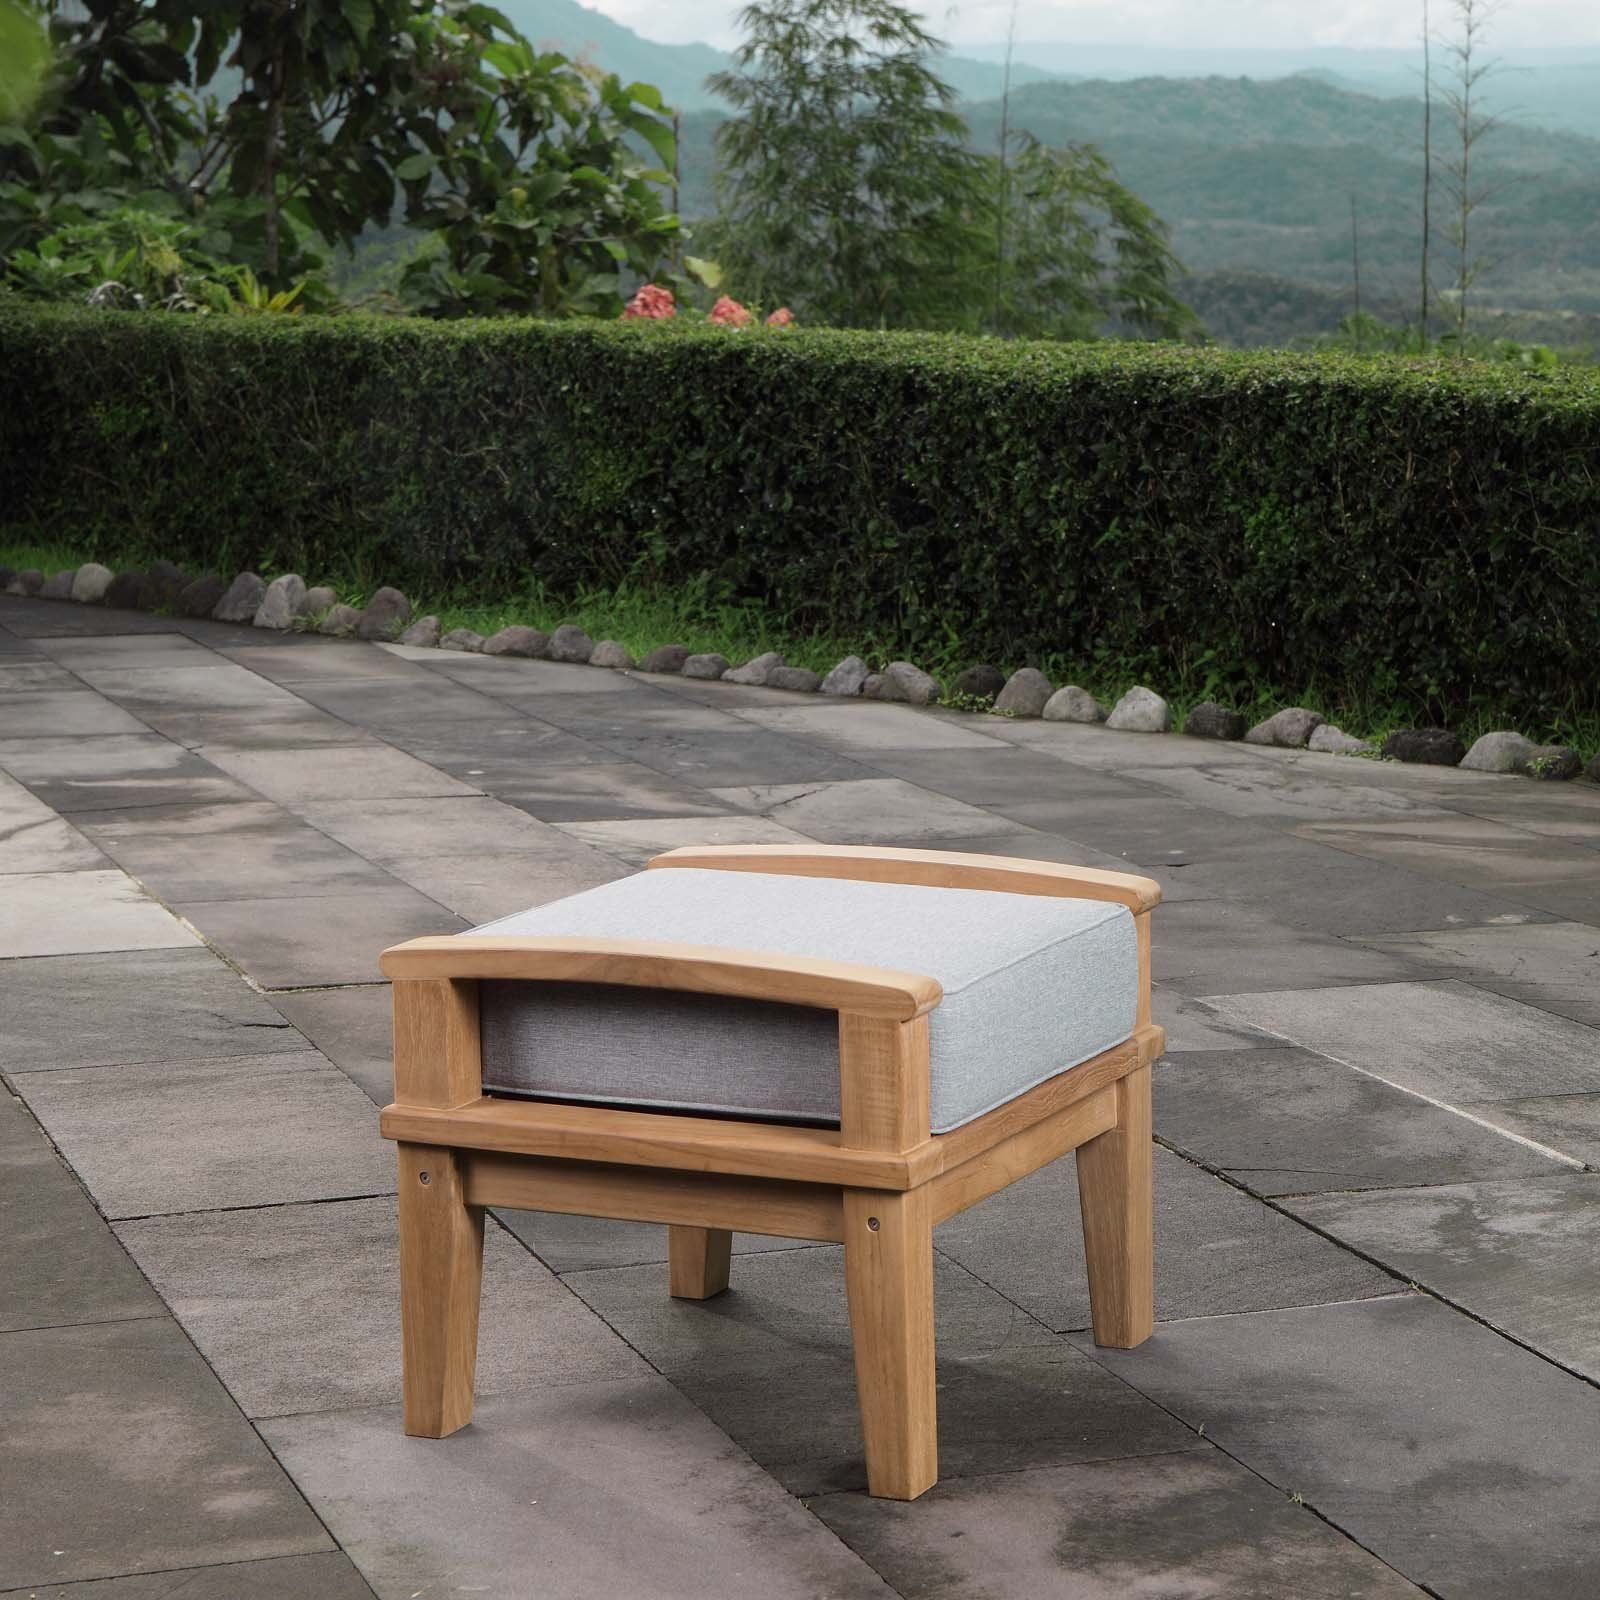 Modway EEI-1152-NAT-GRY-SET Marina Premium Grade A Teak Wood Outdoor Patio Ottoman, Natural Gray